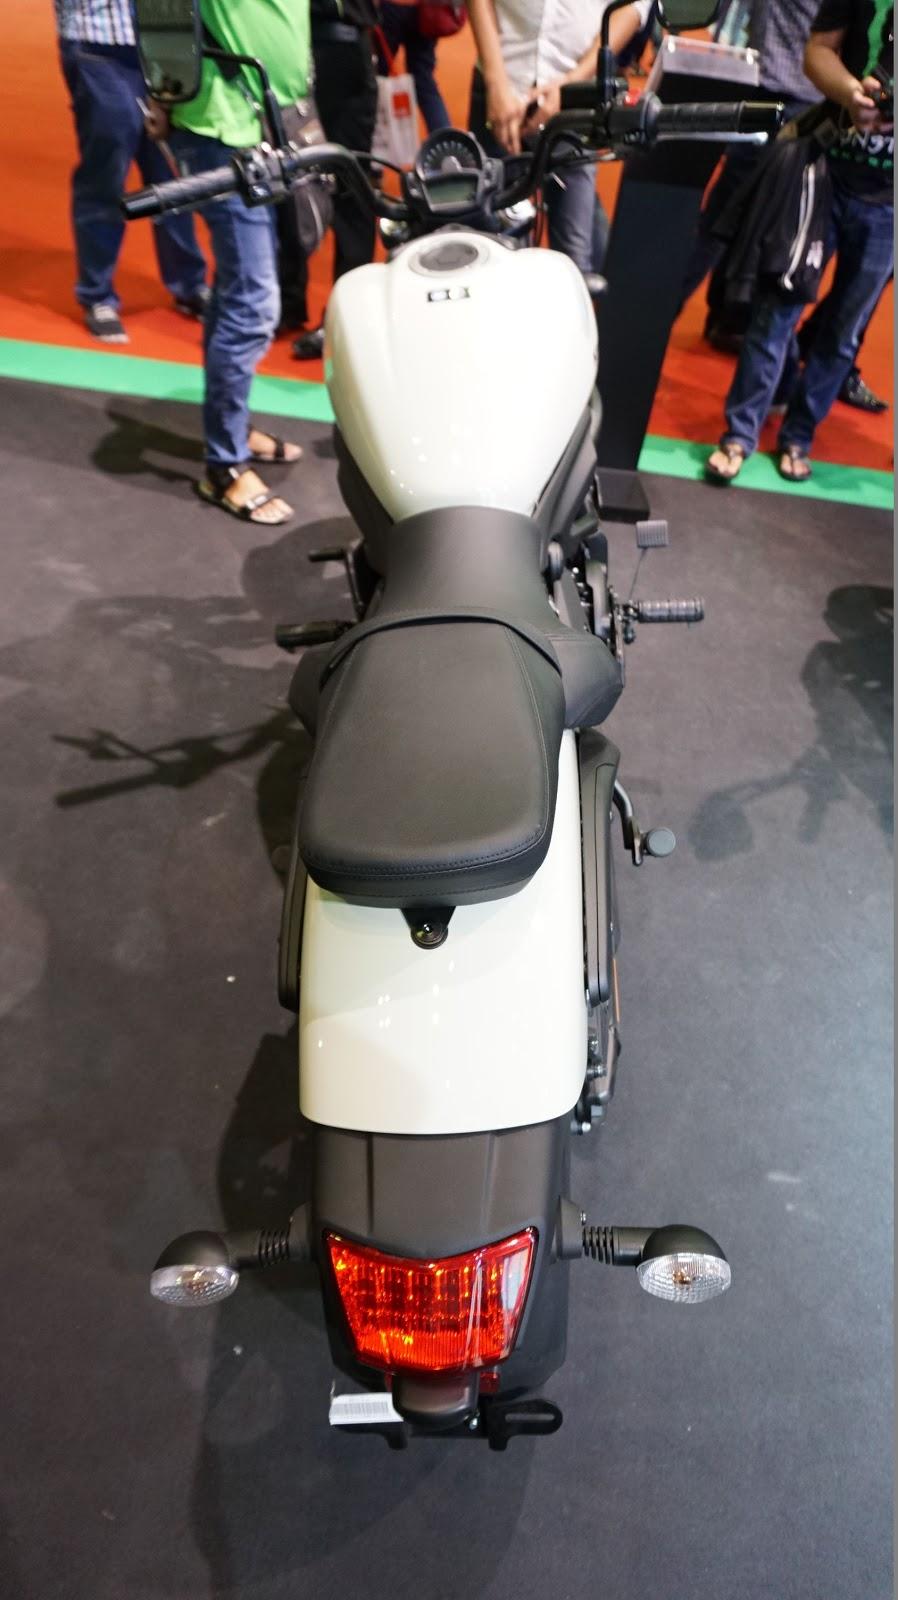 Cận cảnh siêu xe Kawasaki Vulcan S ABS tại VMS 2016